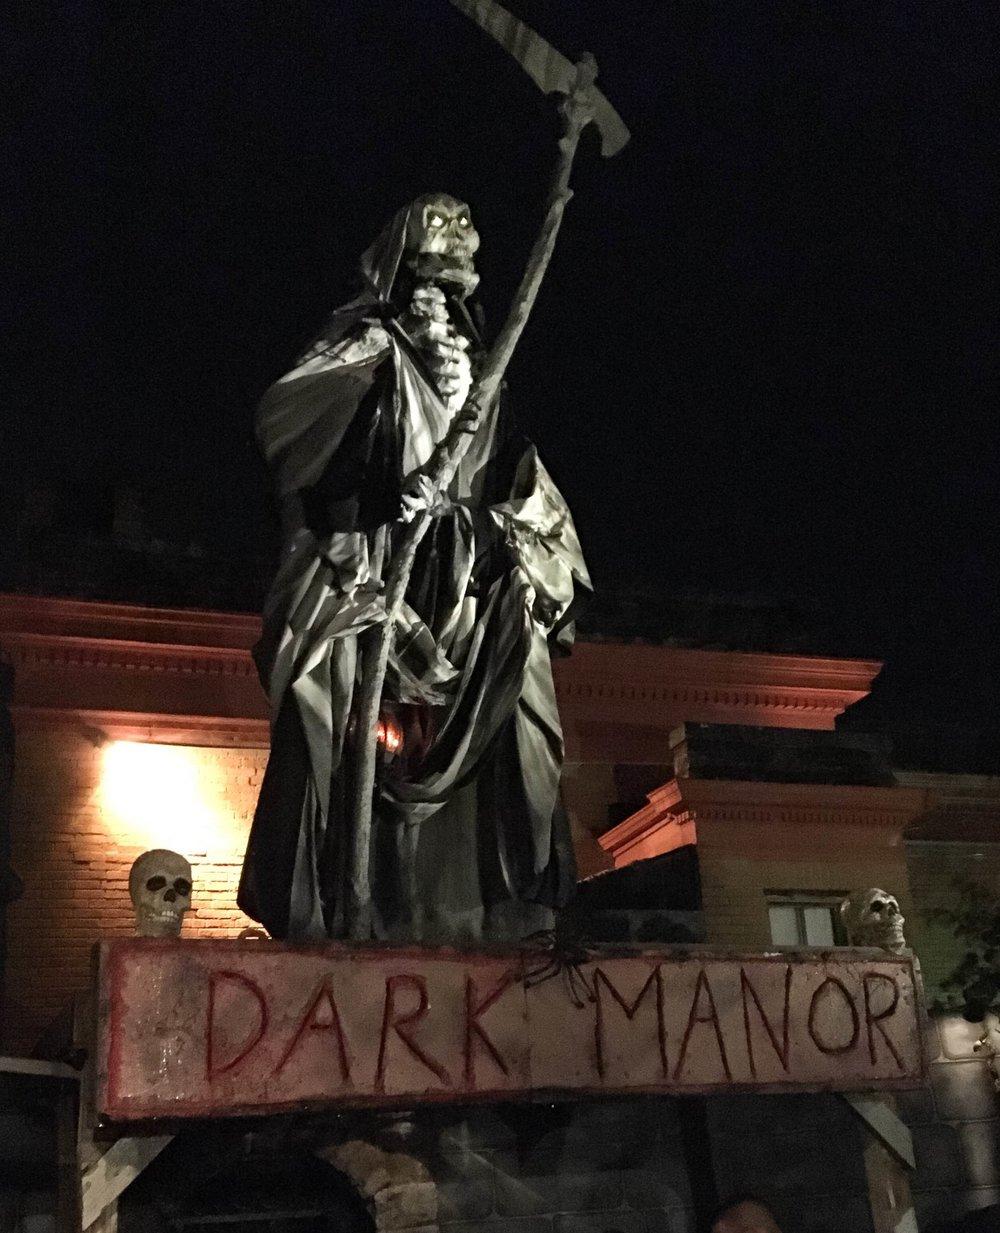 DarkManor.jpg